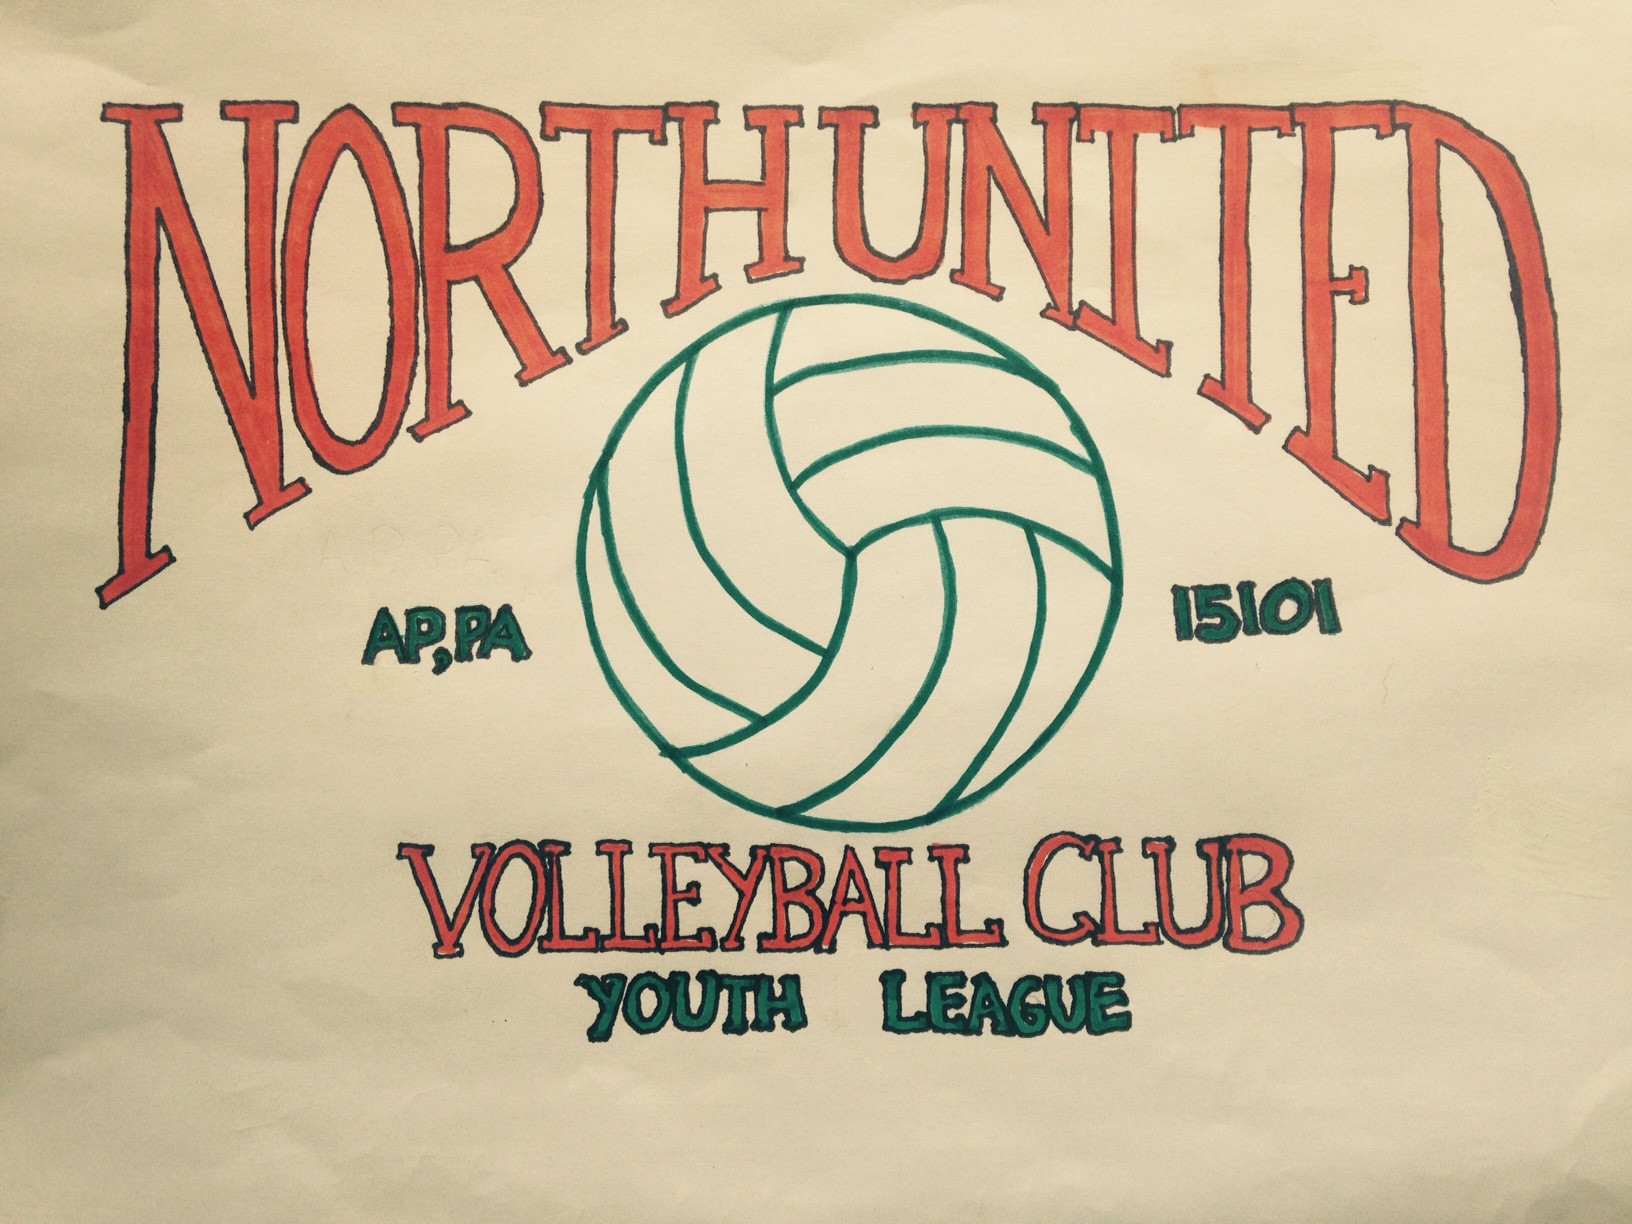 Youth Fall League